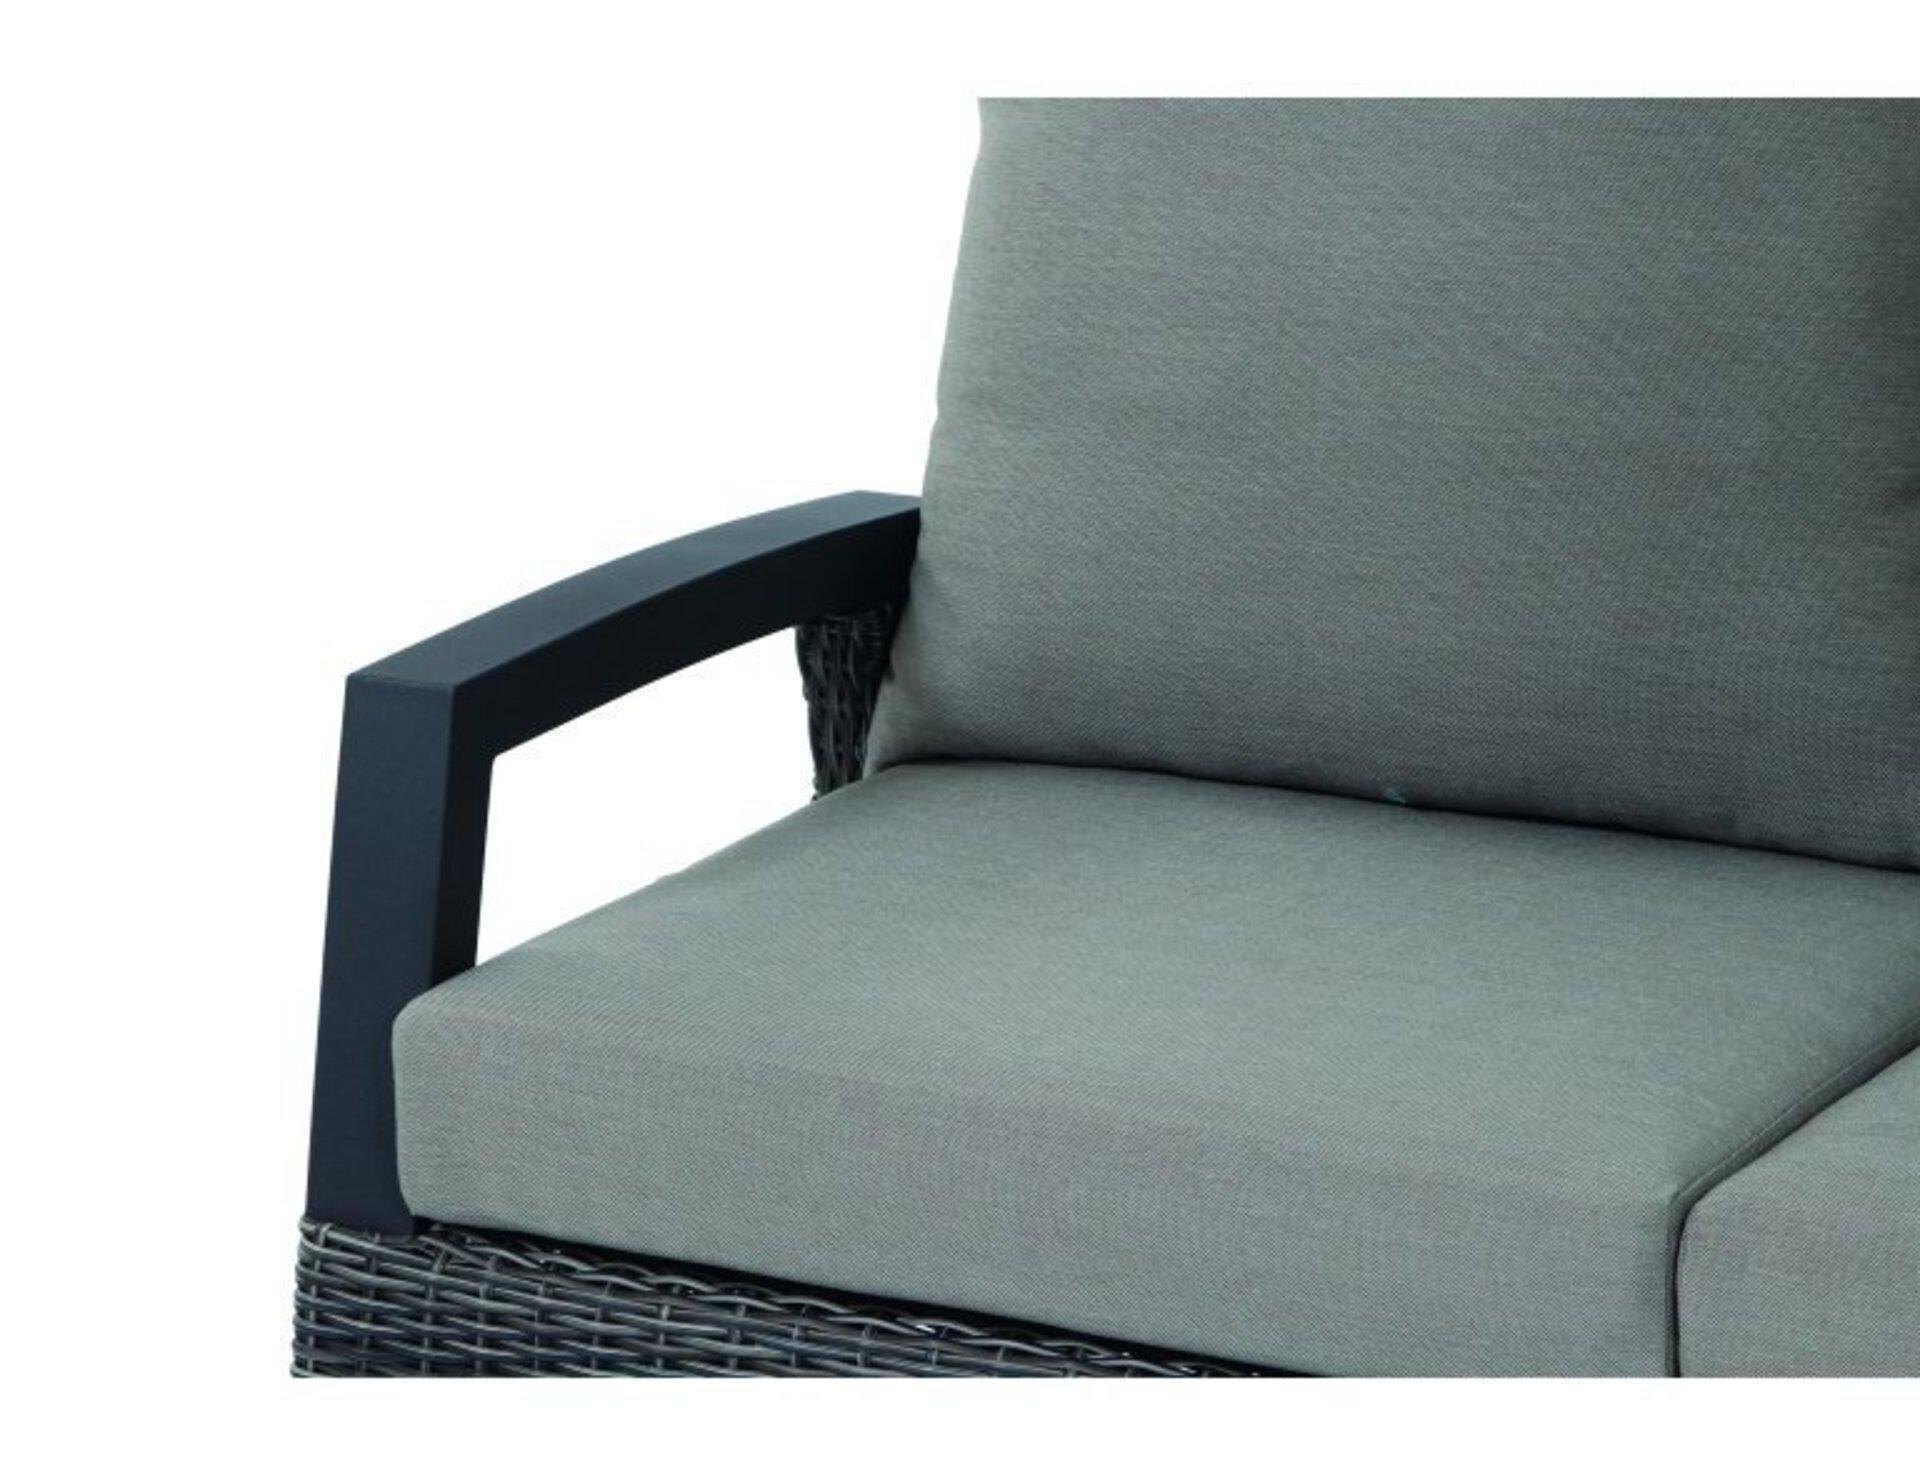 Sofa 2-Sitzer CORIDO Siena Garden Textil grau 83 x 88 x 136 cm